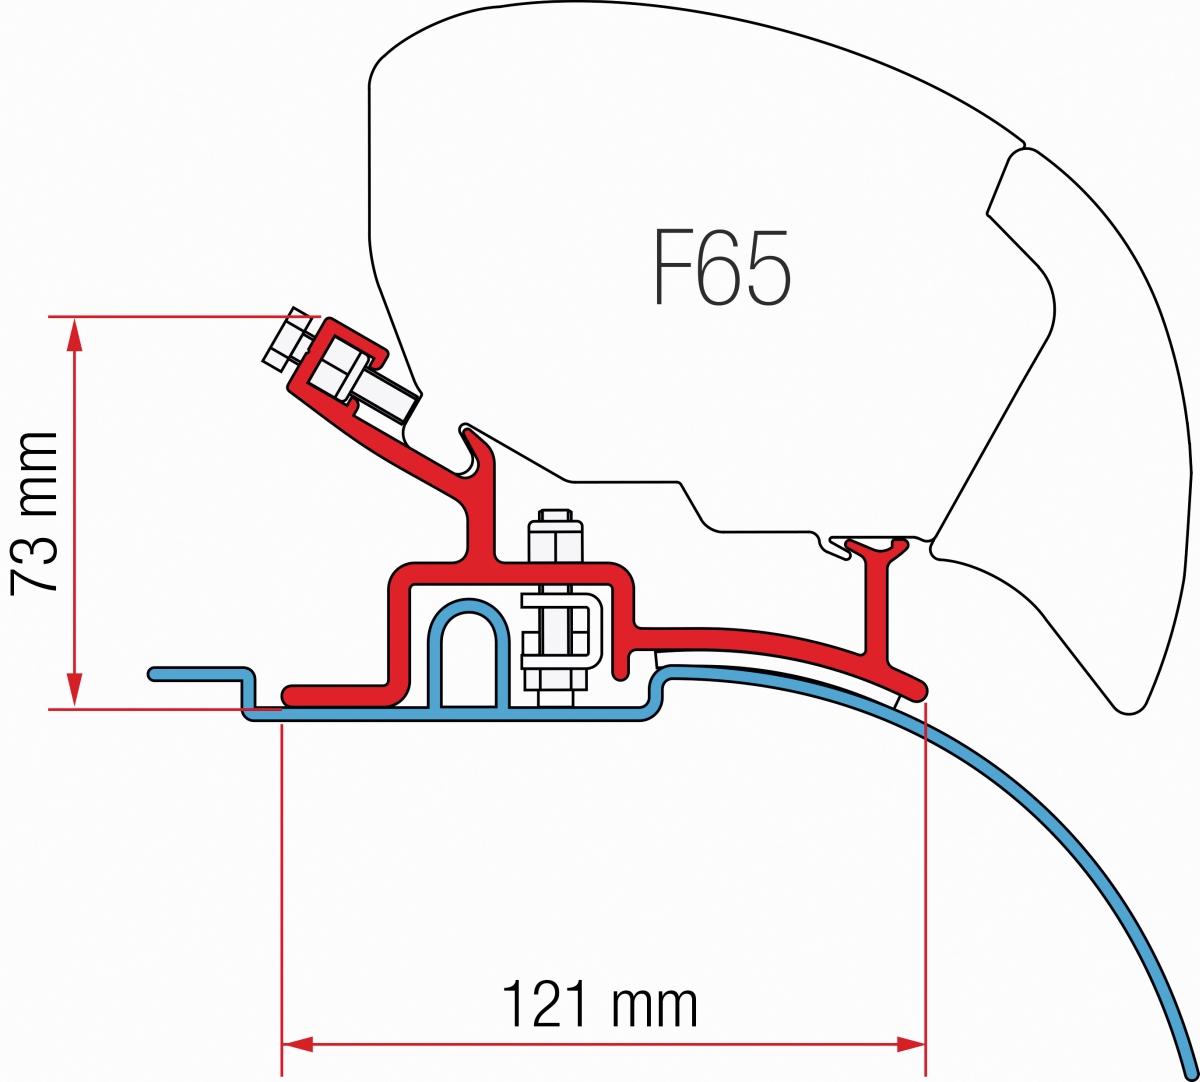 Fiamma F65 Fiat Ducato Adapter bis 2006, hoch